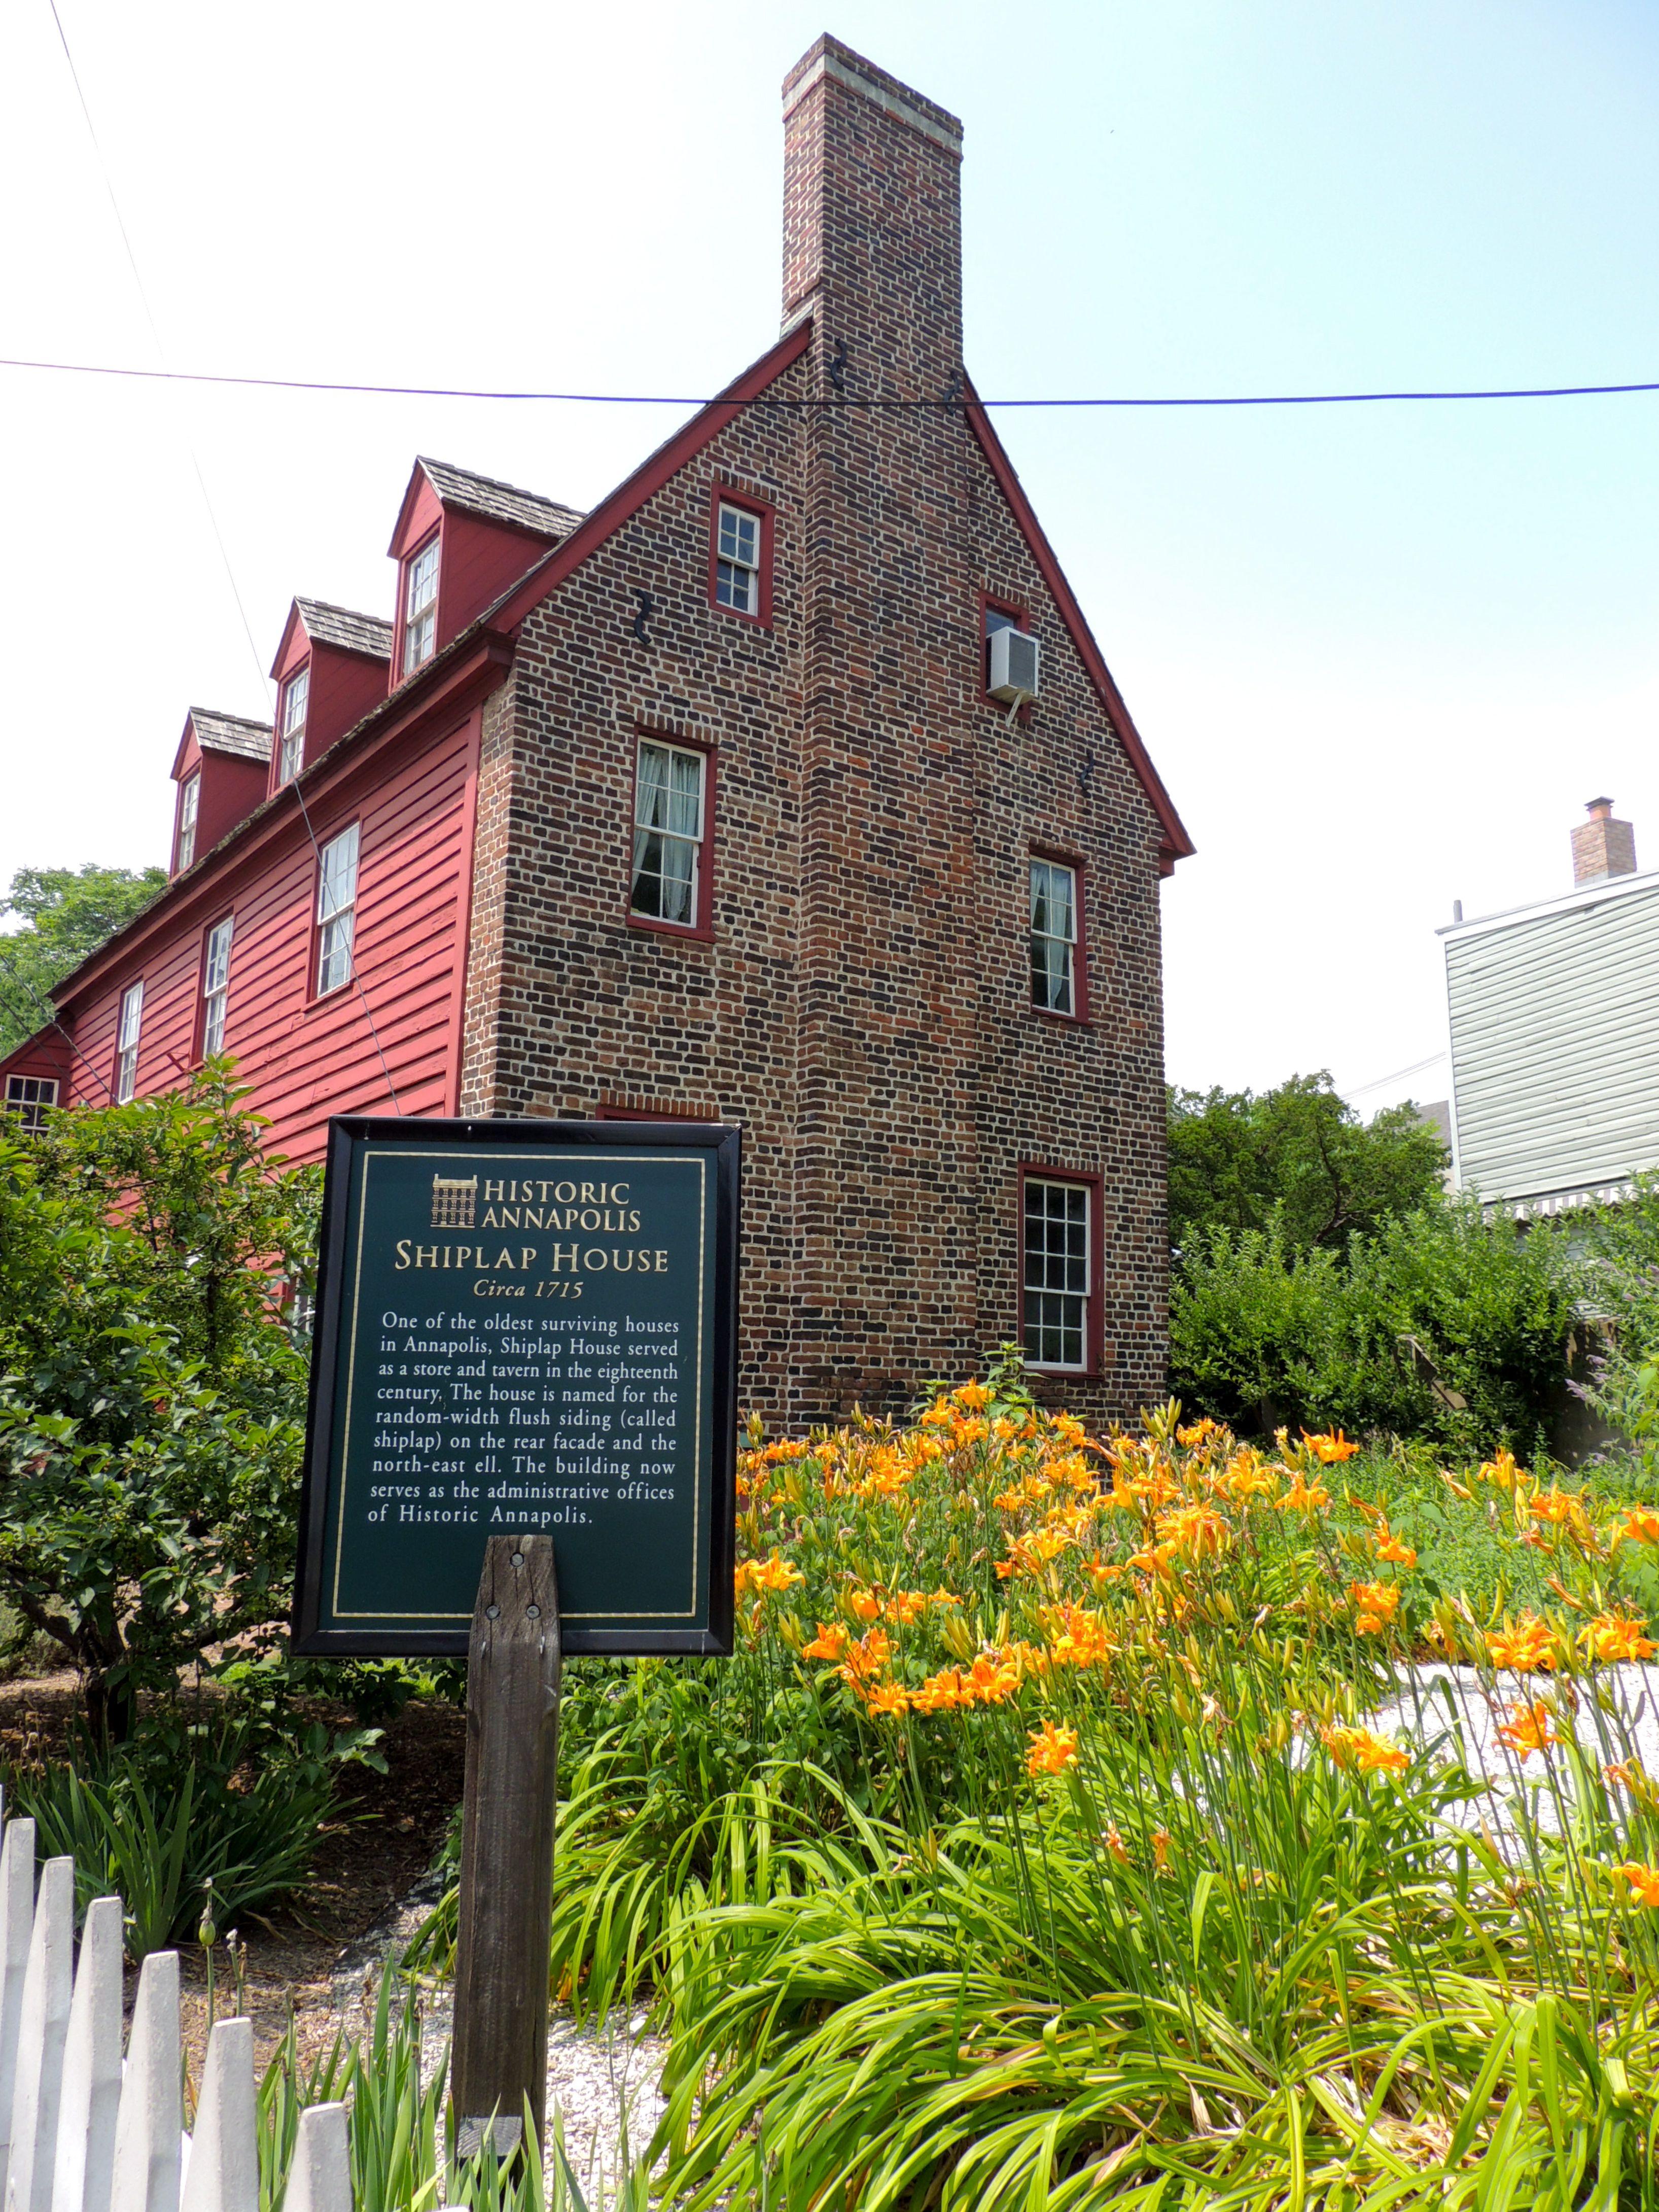 Historic Shiplap House Annapolis Maryland Historic Shiplap House Annapolis